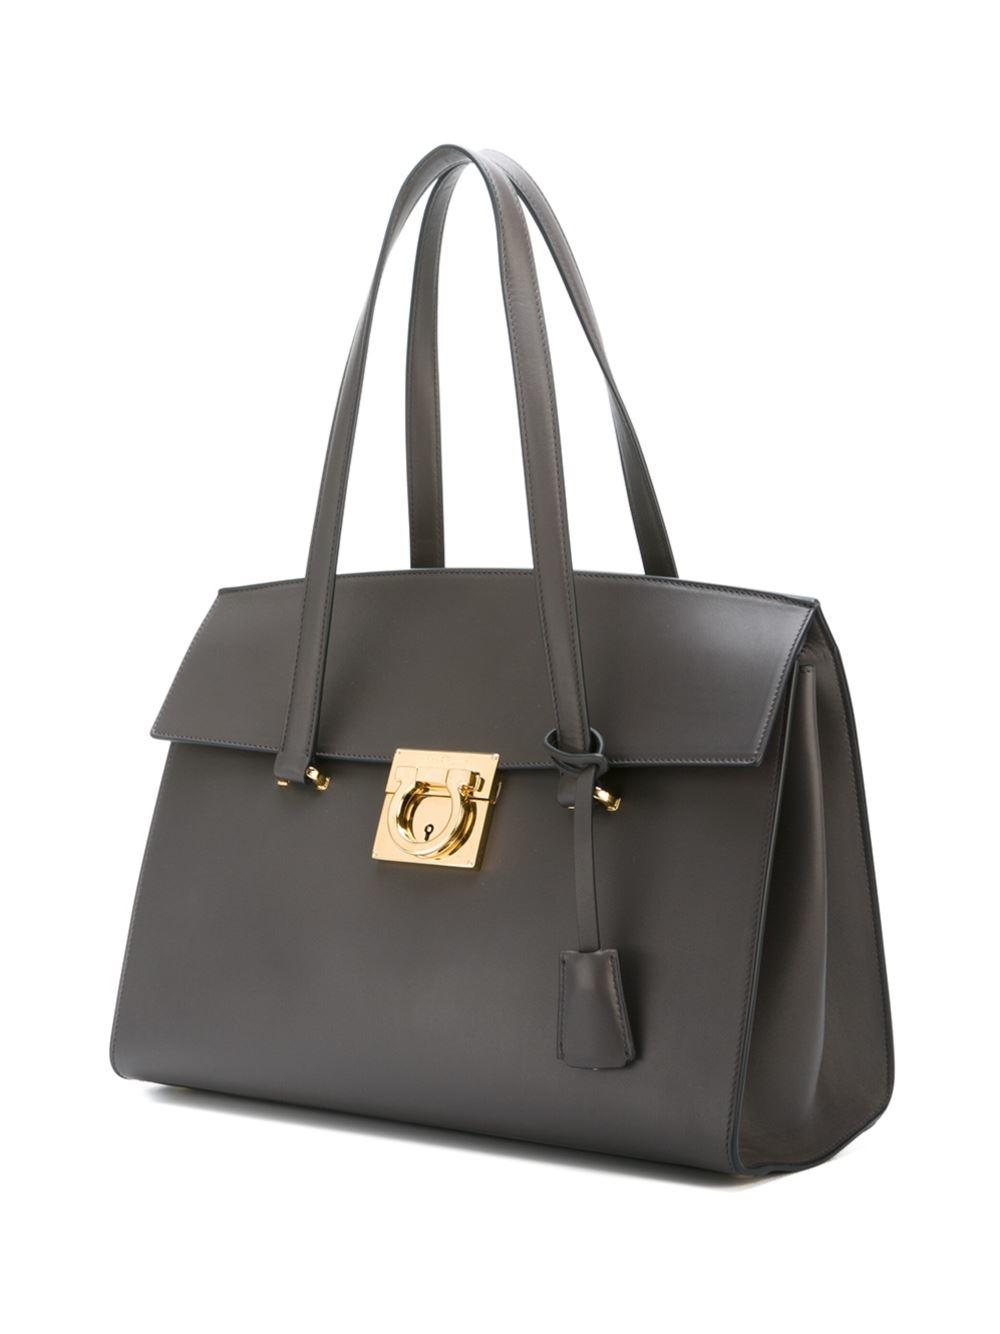 Ferragamo Leather 'mara' Tote in Grey (Grey)